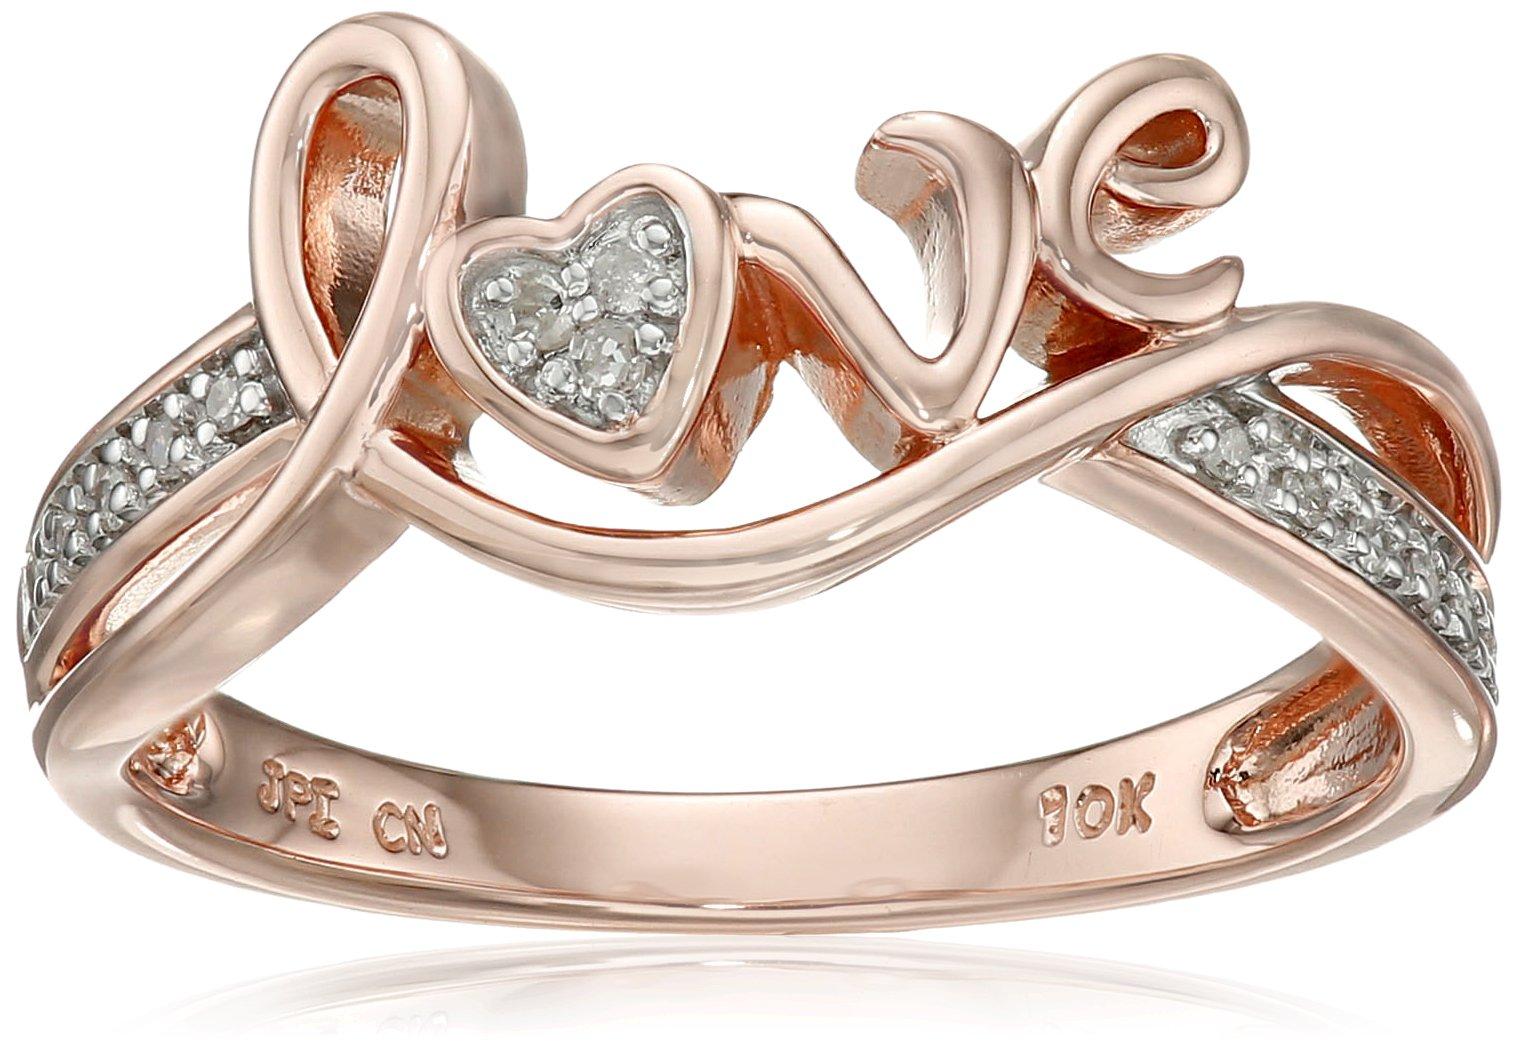 10k Rose Gold Love Diamond Ring (0.05 cttw, I-J Color, I2-I3 Clarity), Size 8